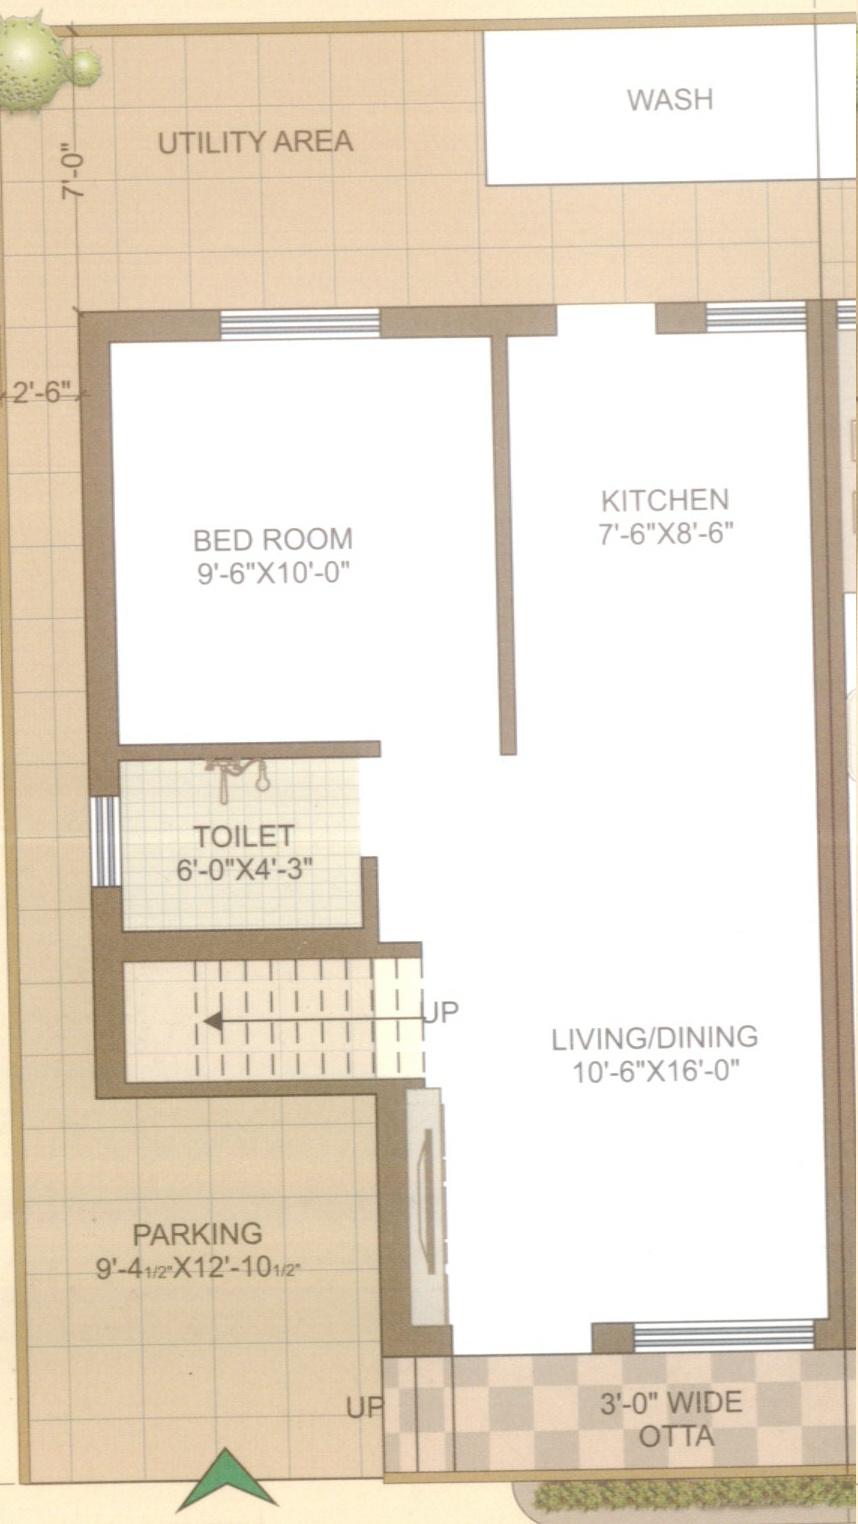 Shree hari duplex in atladara vadodara price location for Duplex plans and prices